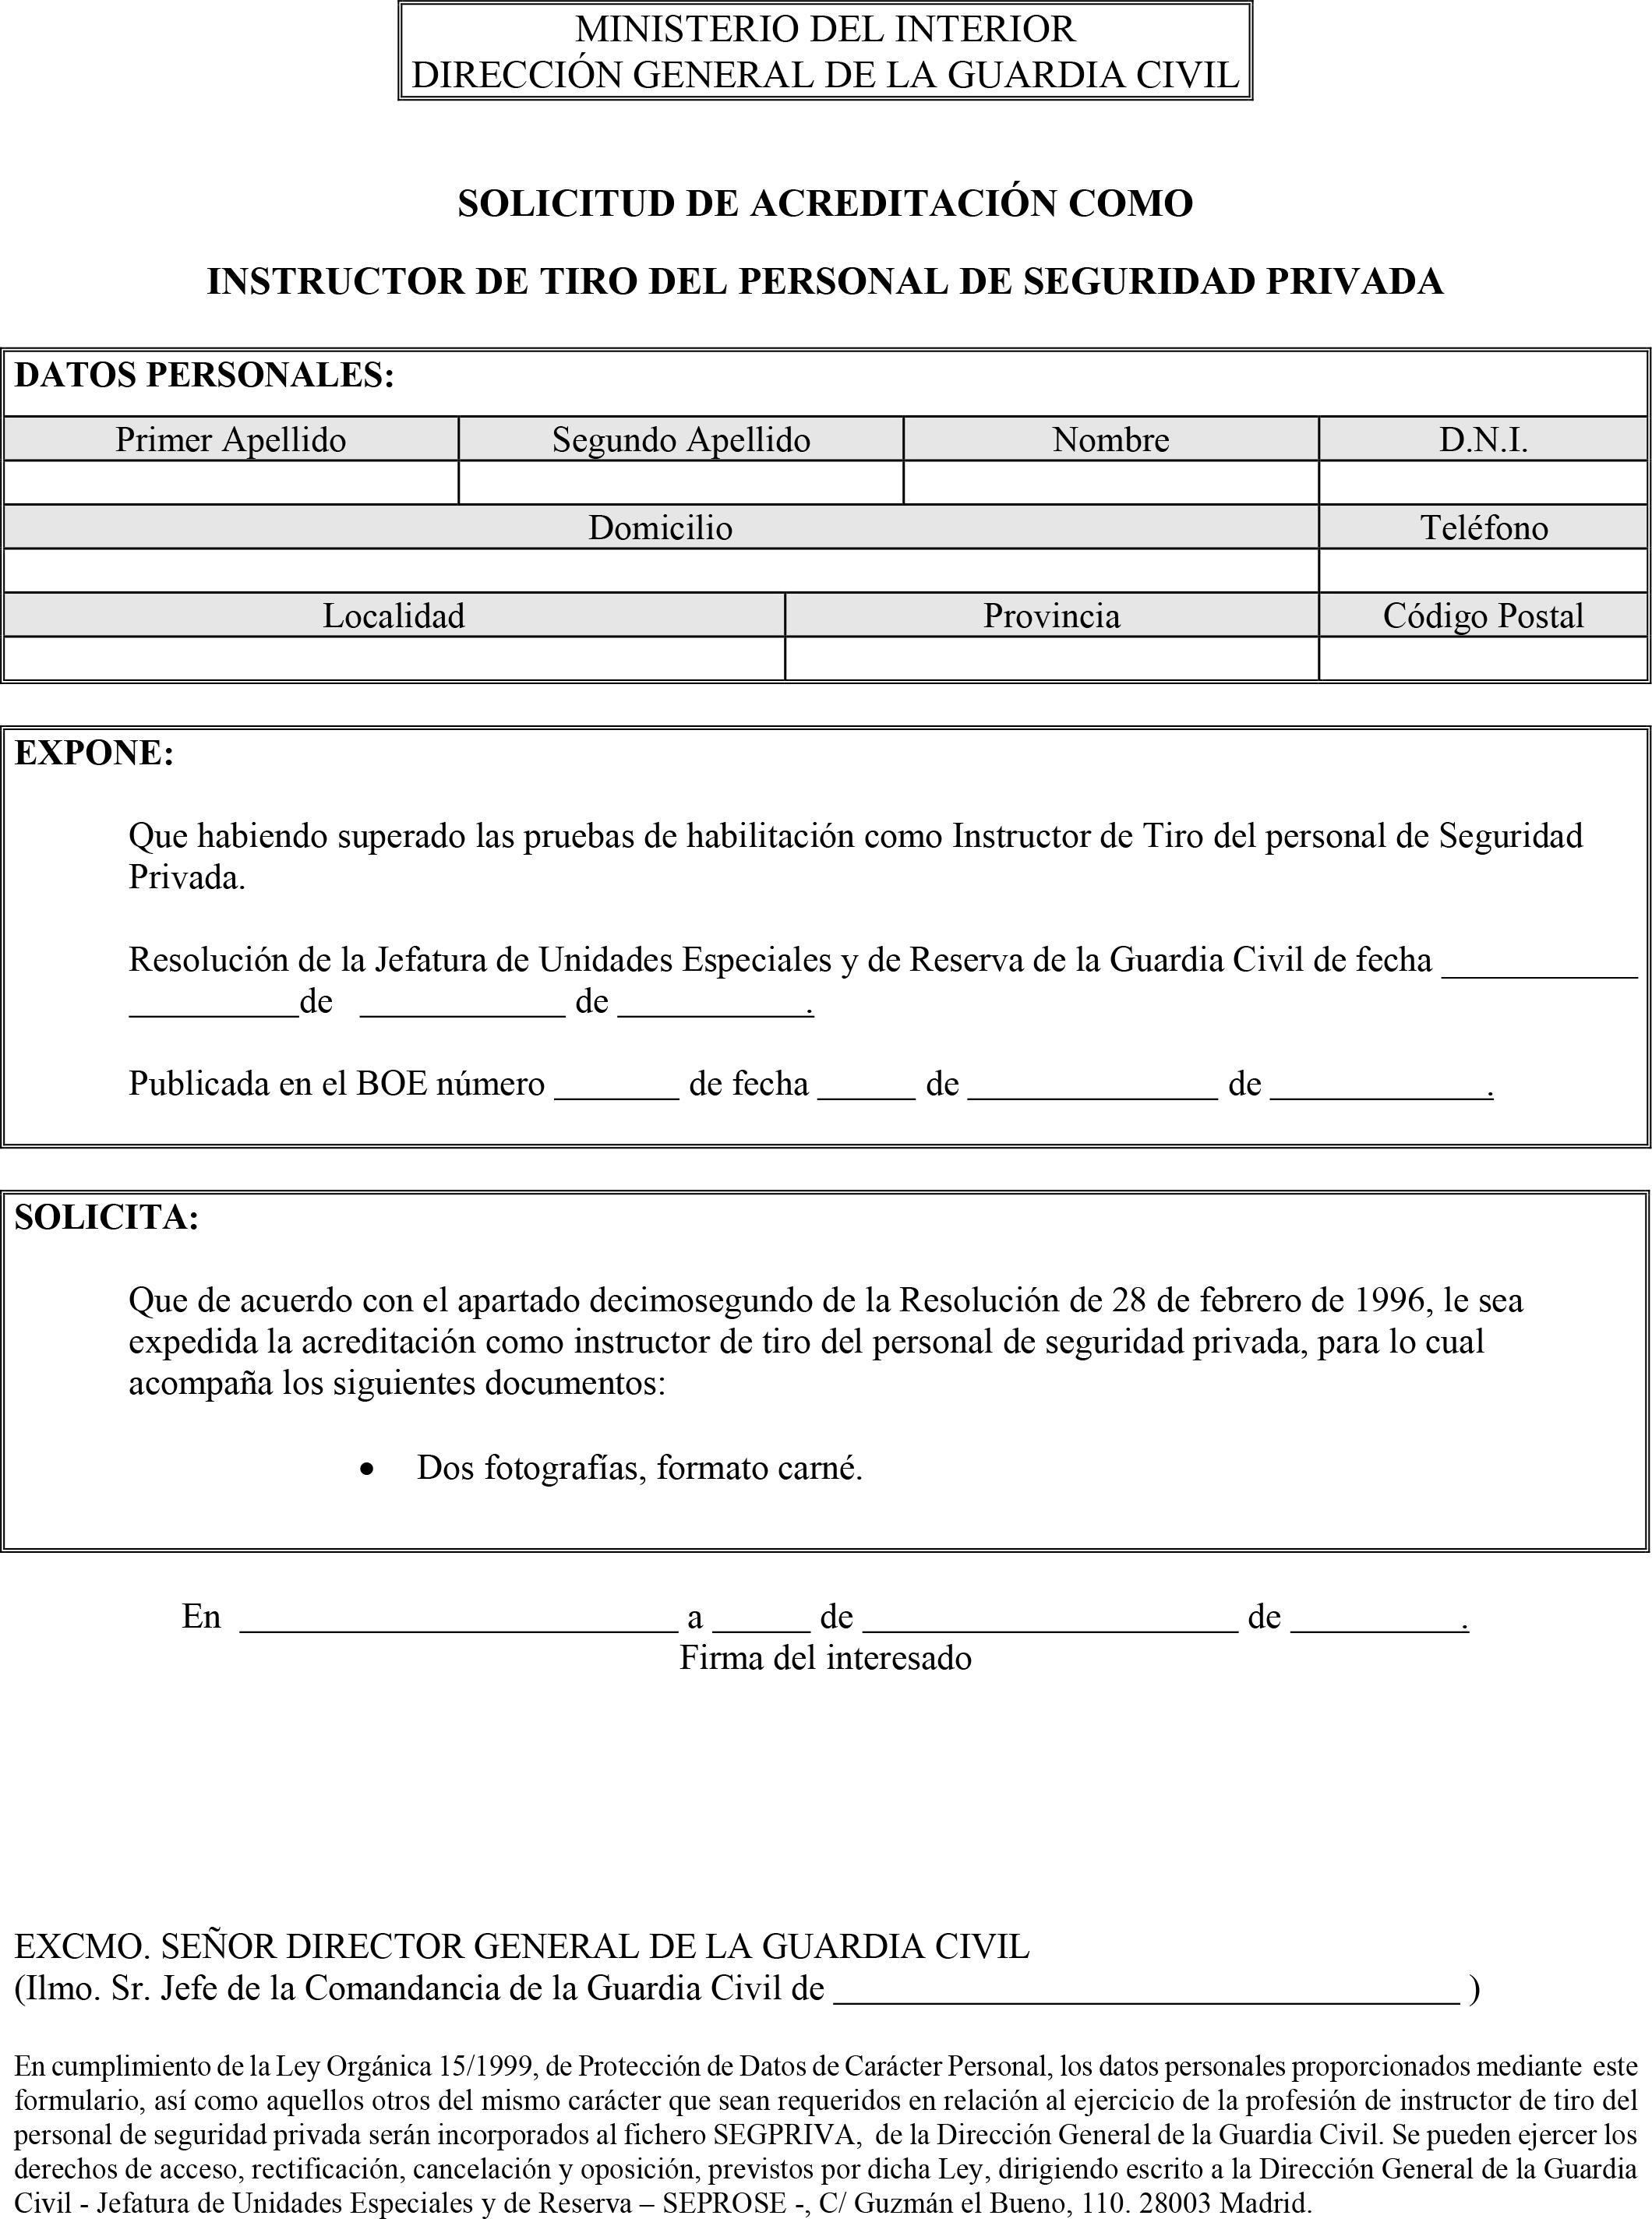 BOE.es - Documento BOE-A-2018-8432